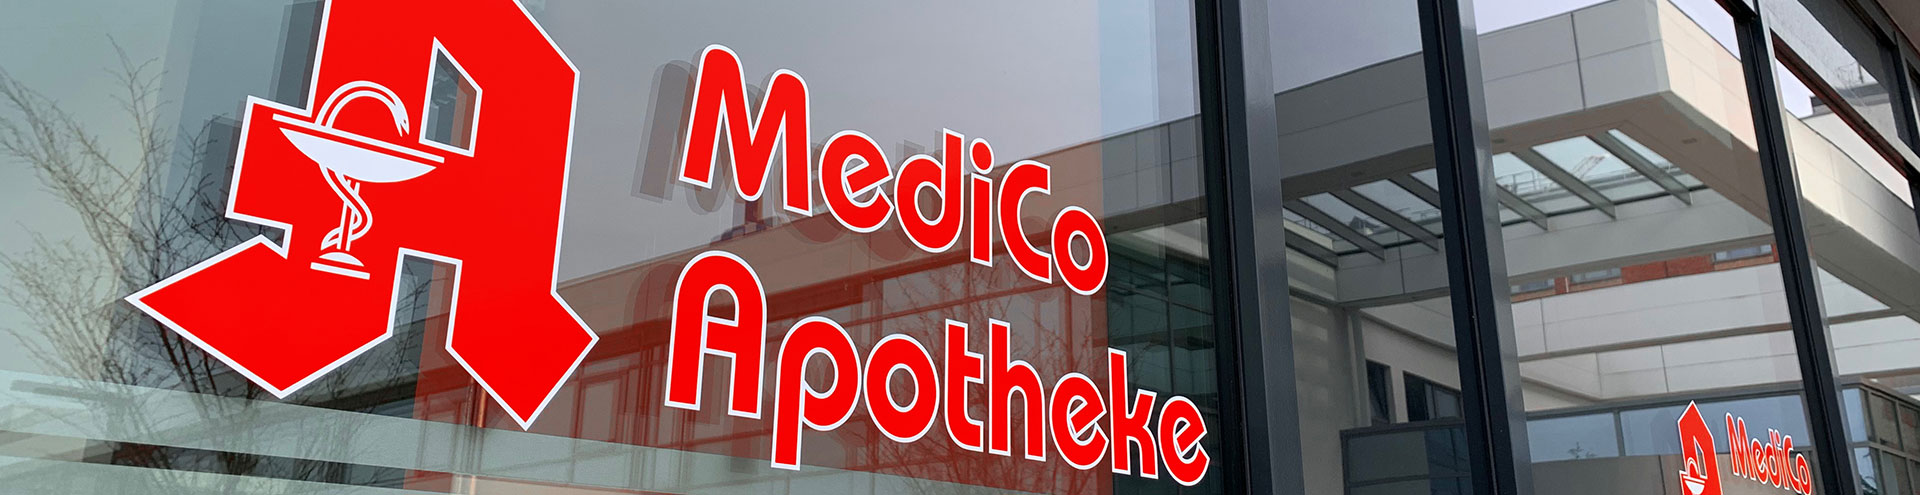 Apotheke im MediCo